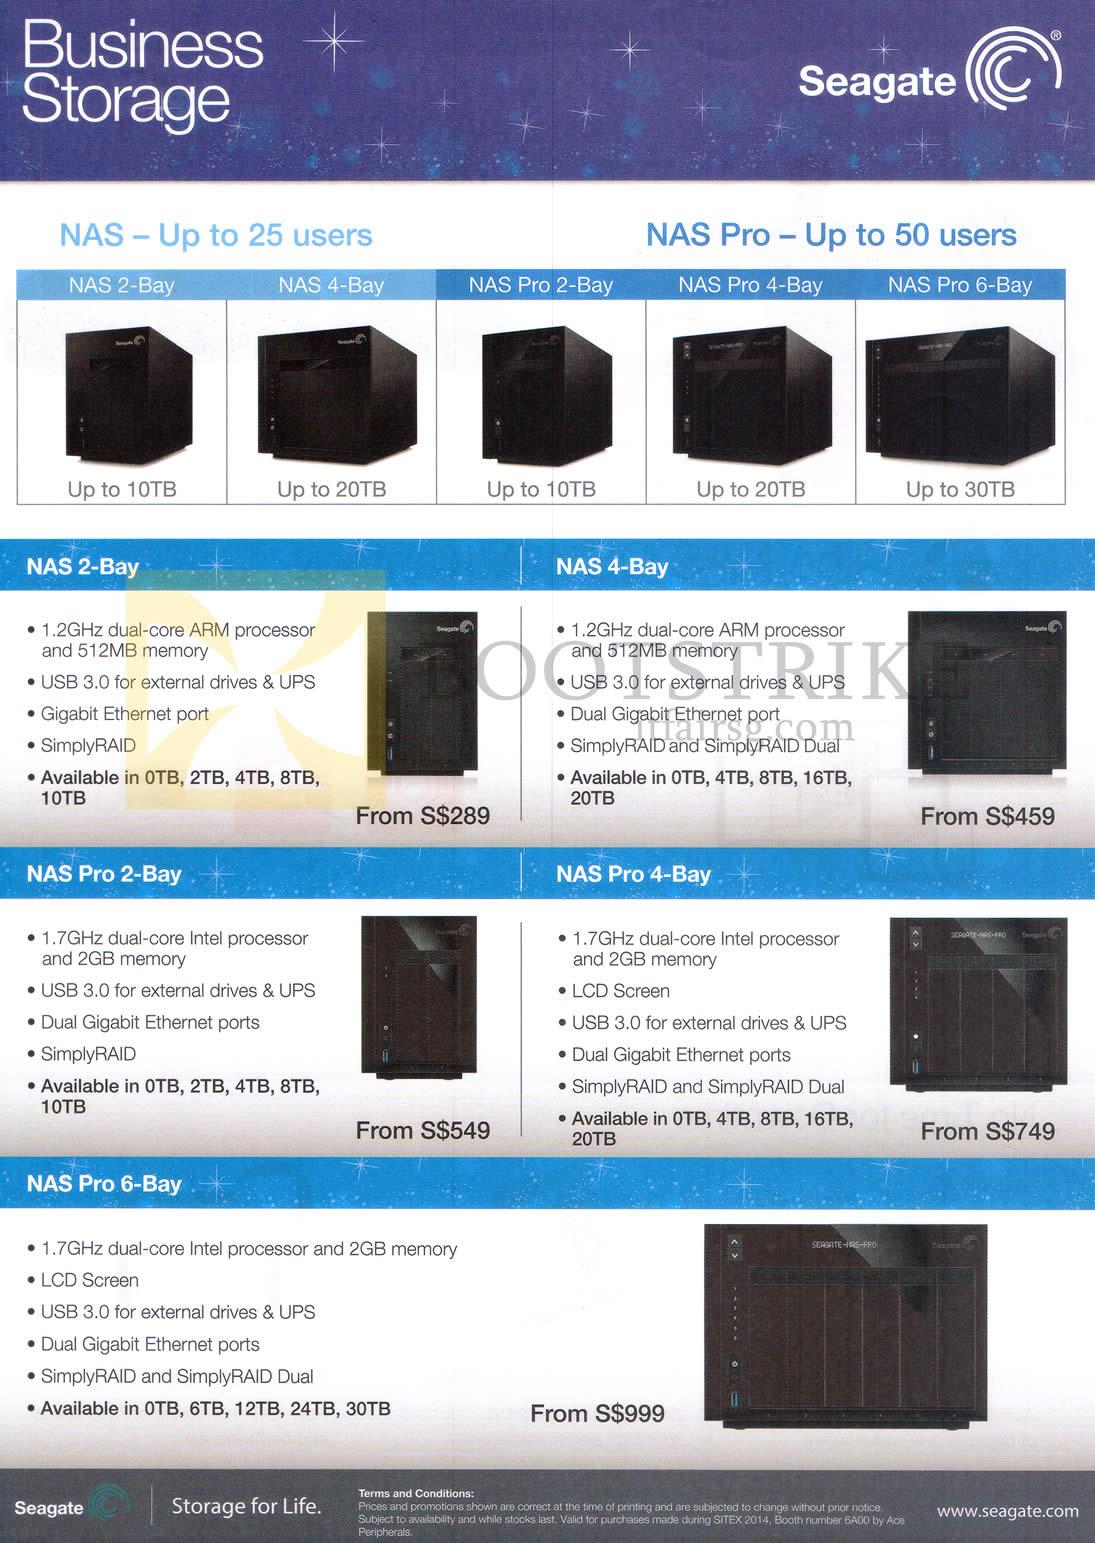 SITEX 2014 price list image brochure of Seagate Business Storage NAS 2-Bay, 4-Bay, Pro 2-Bay, Pro 4-Bay, Pro 6-Bay